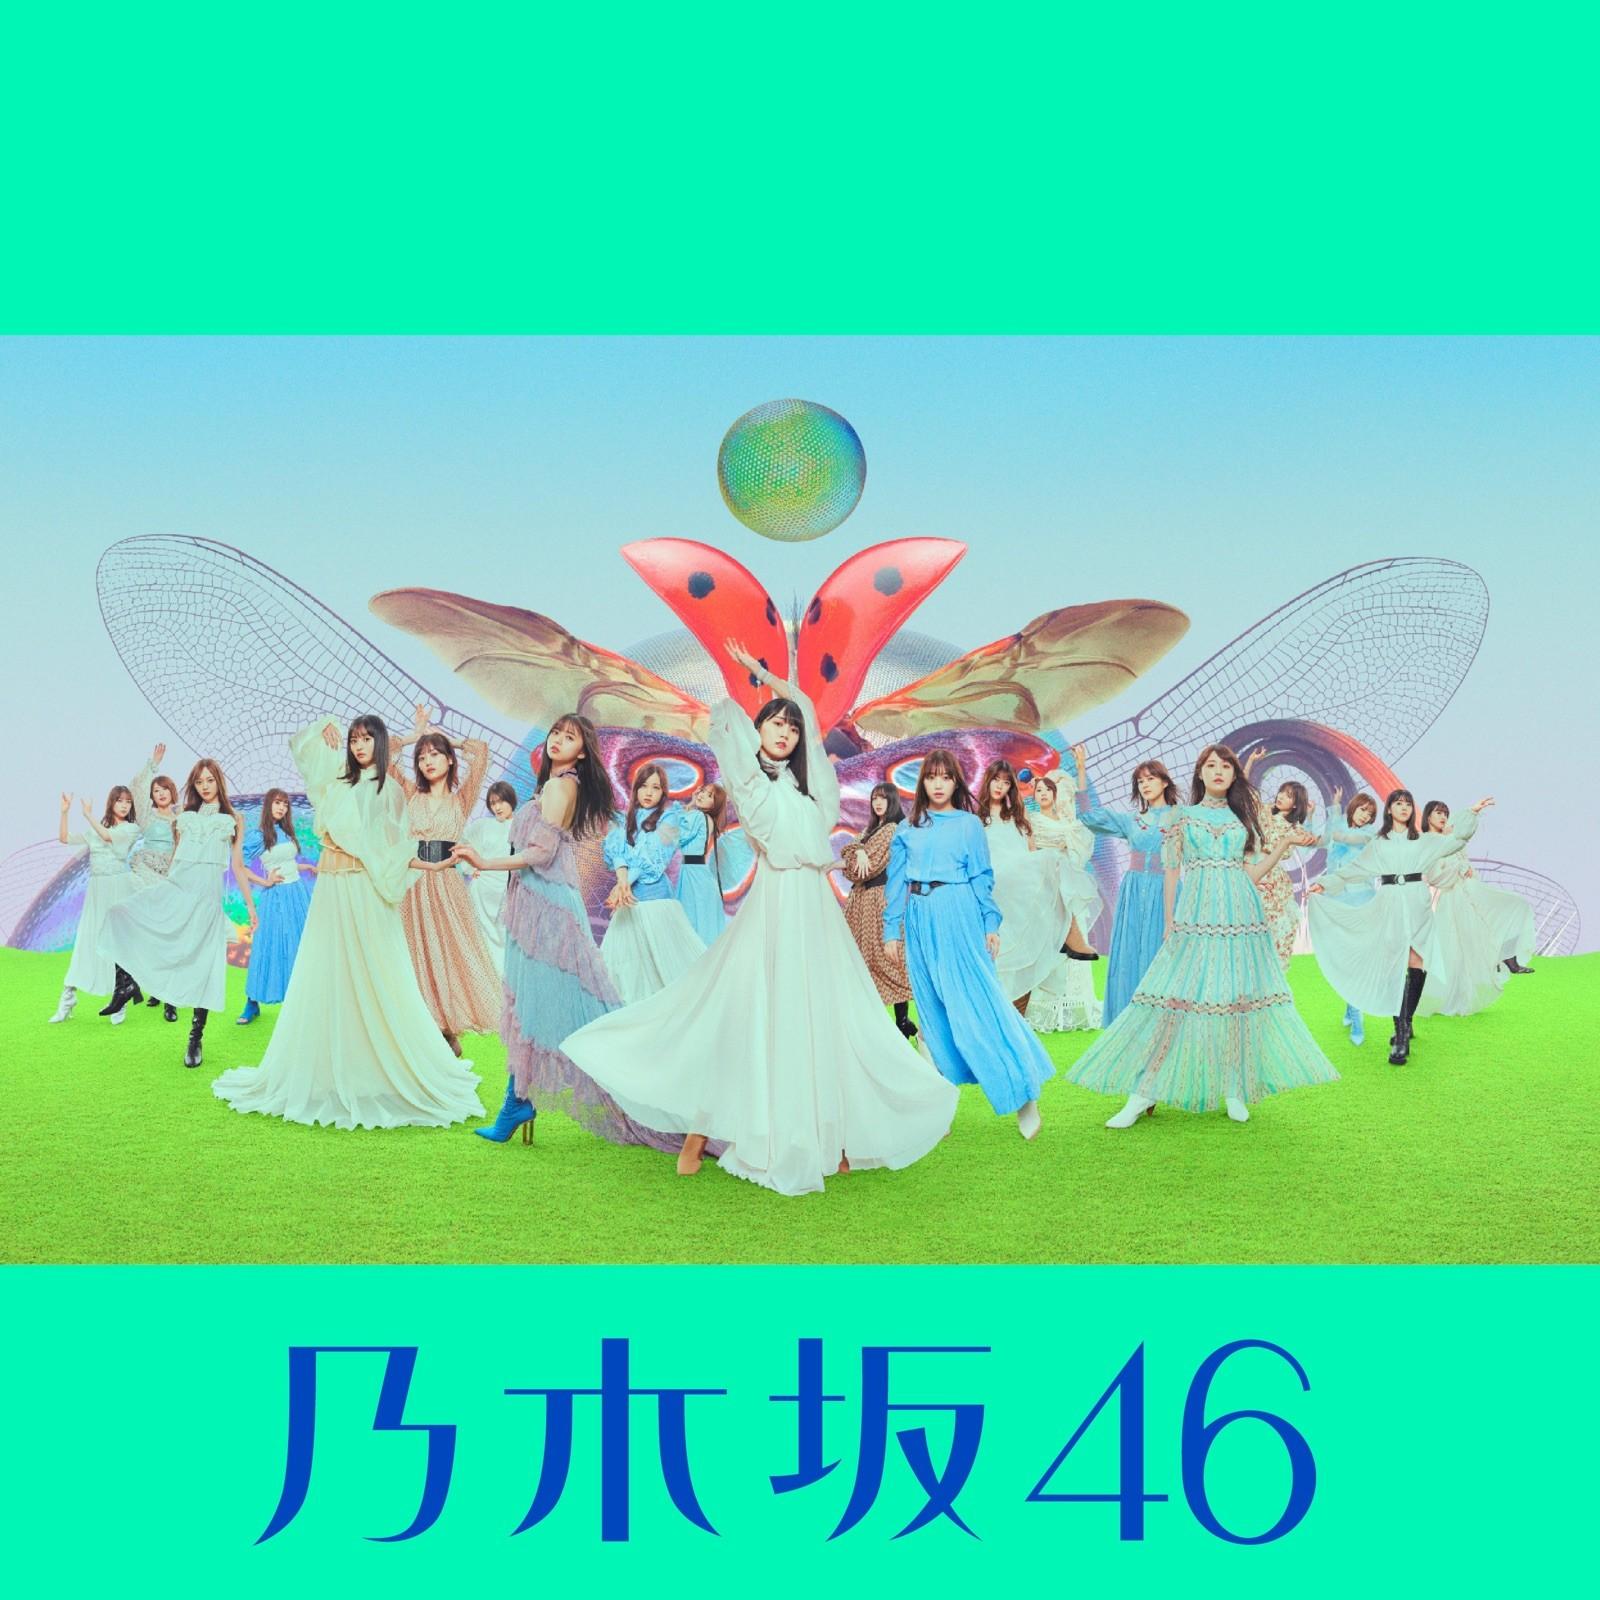 [Album] 乃木坂46 (Nogizaka46) – 君に叱られた [FLAC + MP3 / WEB] [2021.09.22]